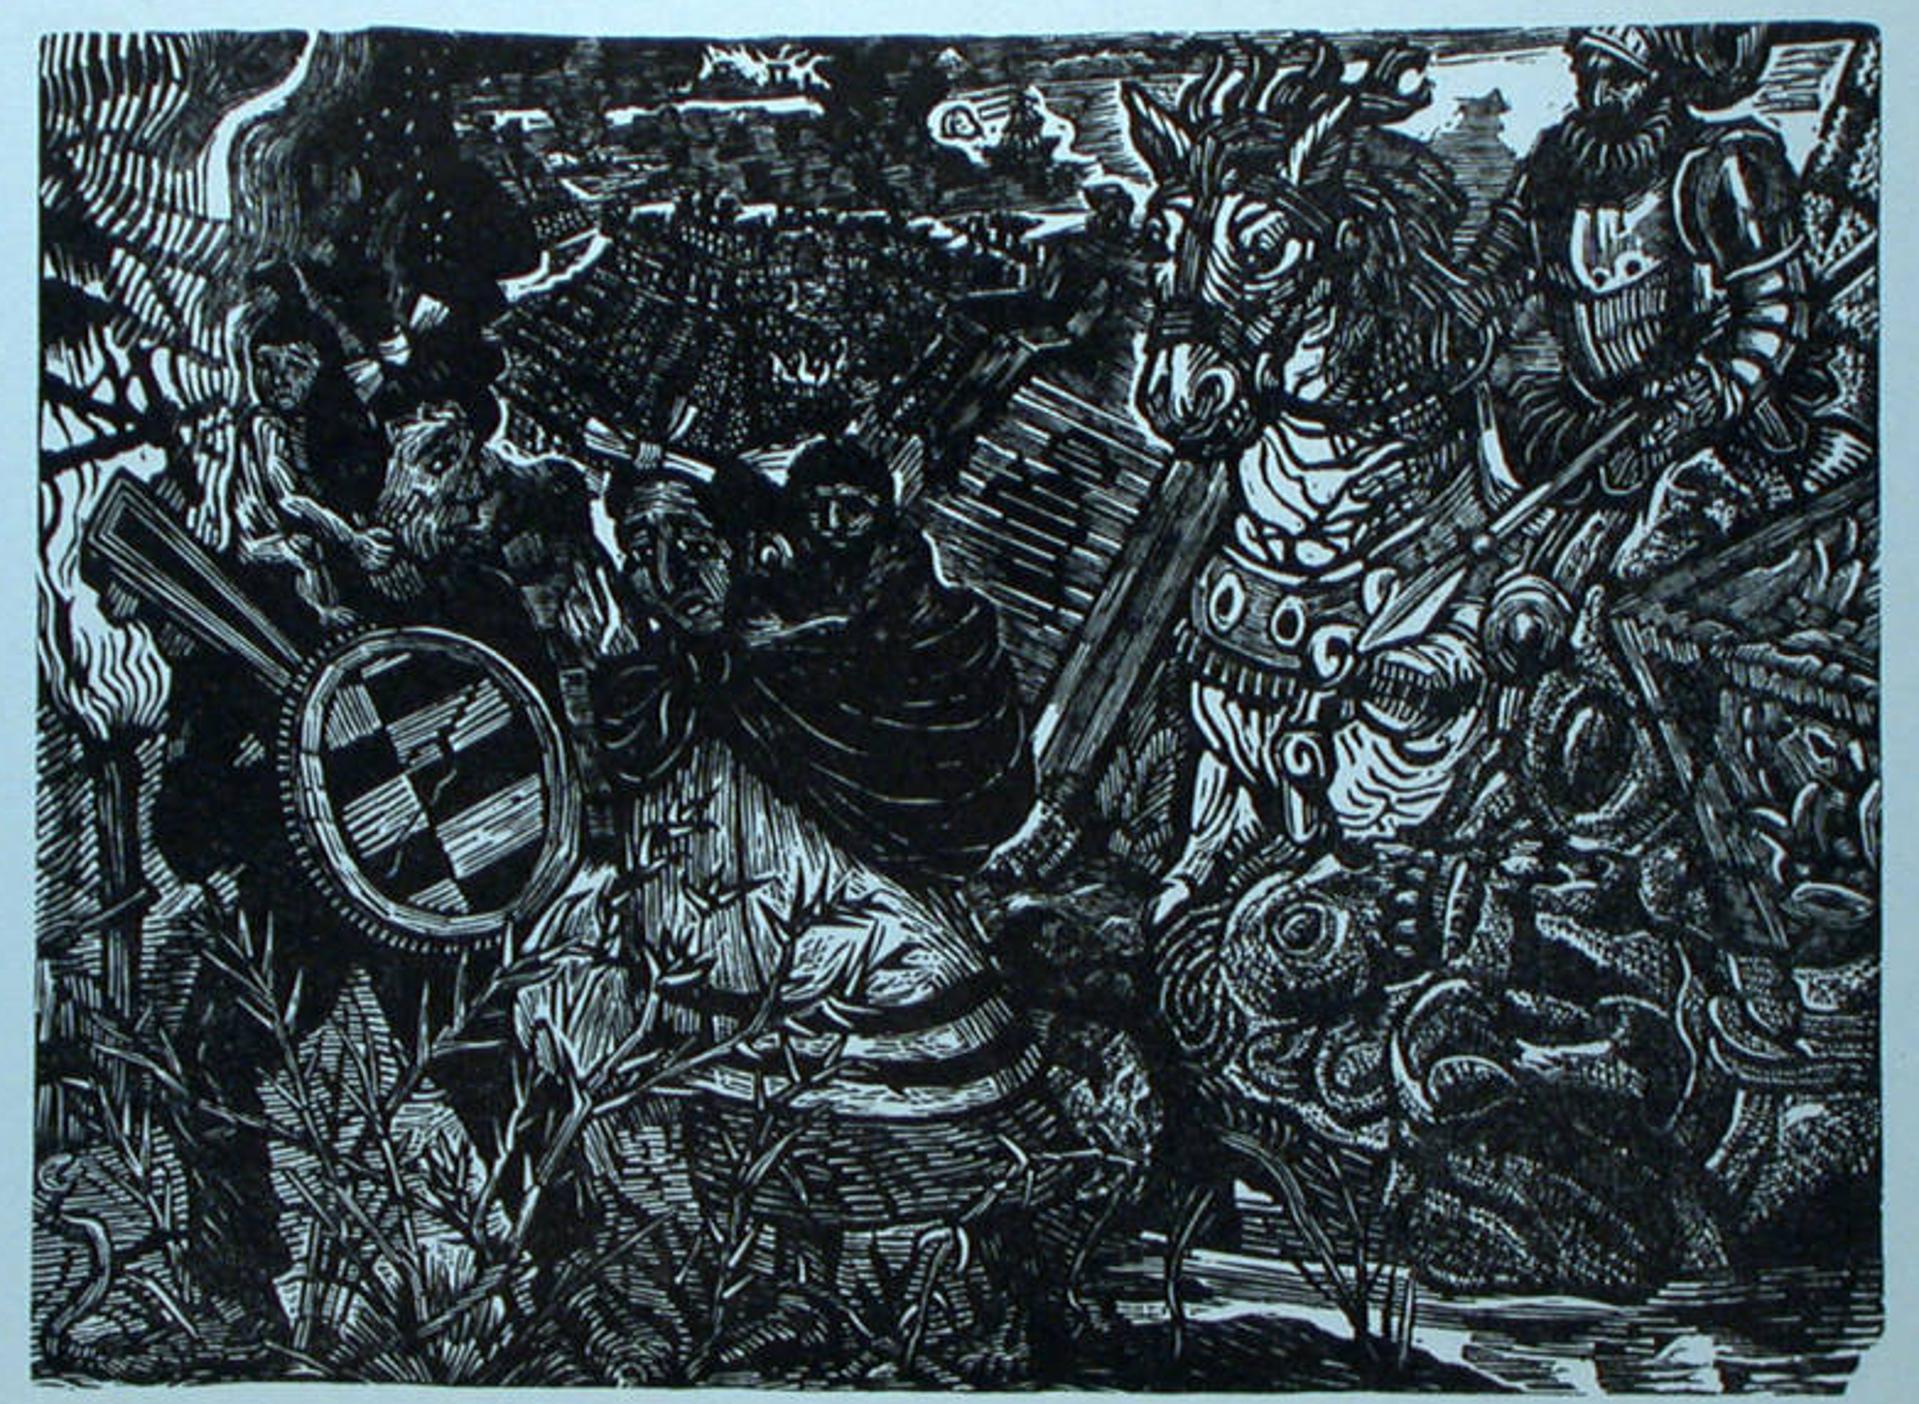 Caida de Tenochtitlán by Ángel Bracho (1911 - 2005)